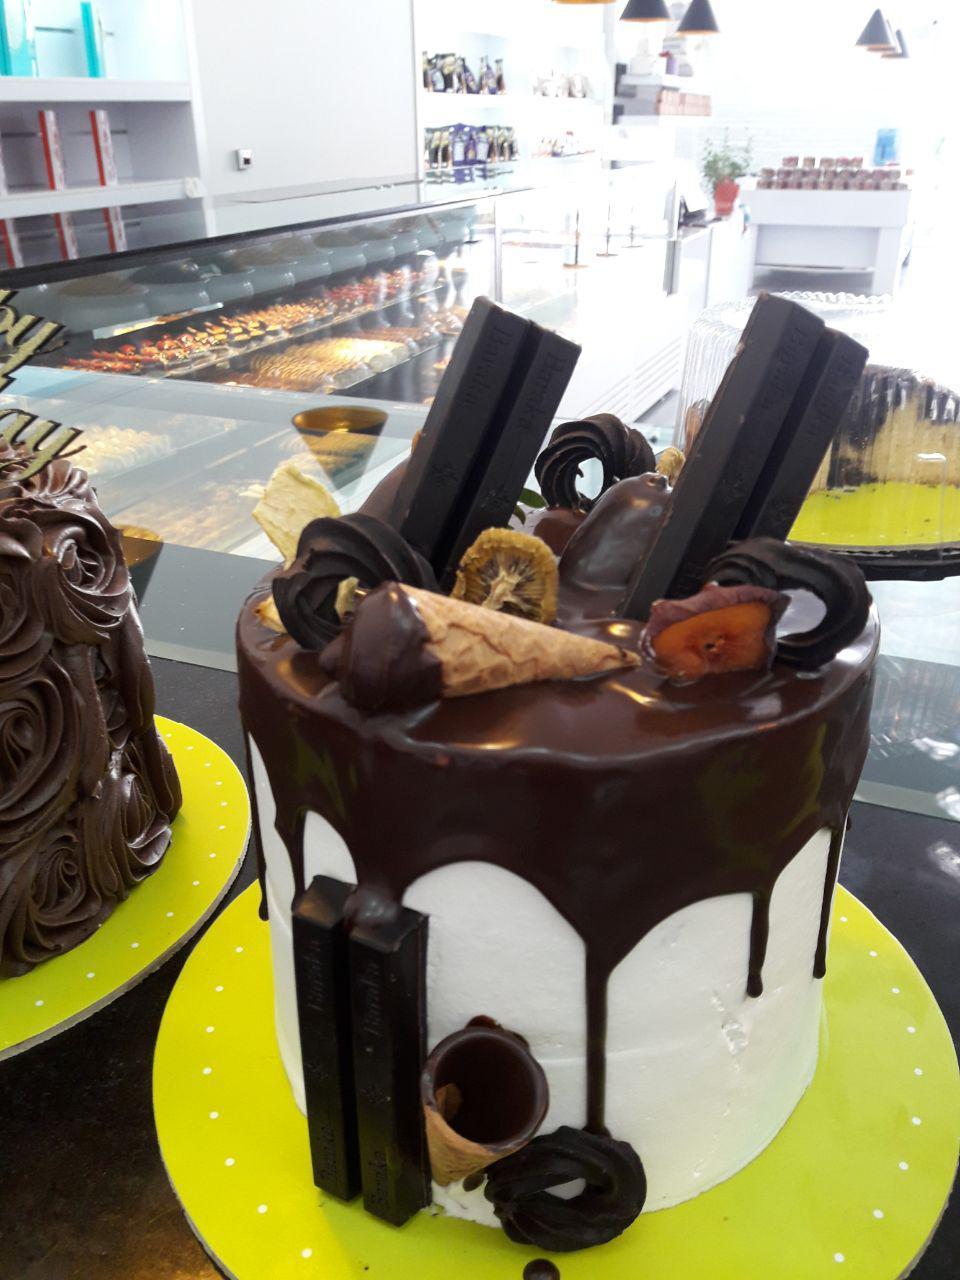 بریم شیرینی 7